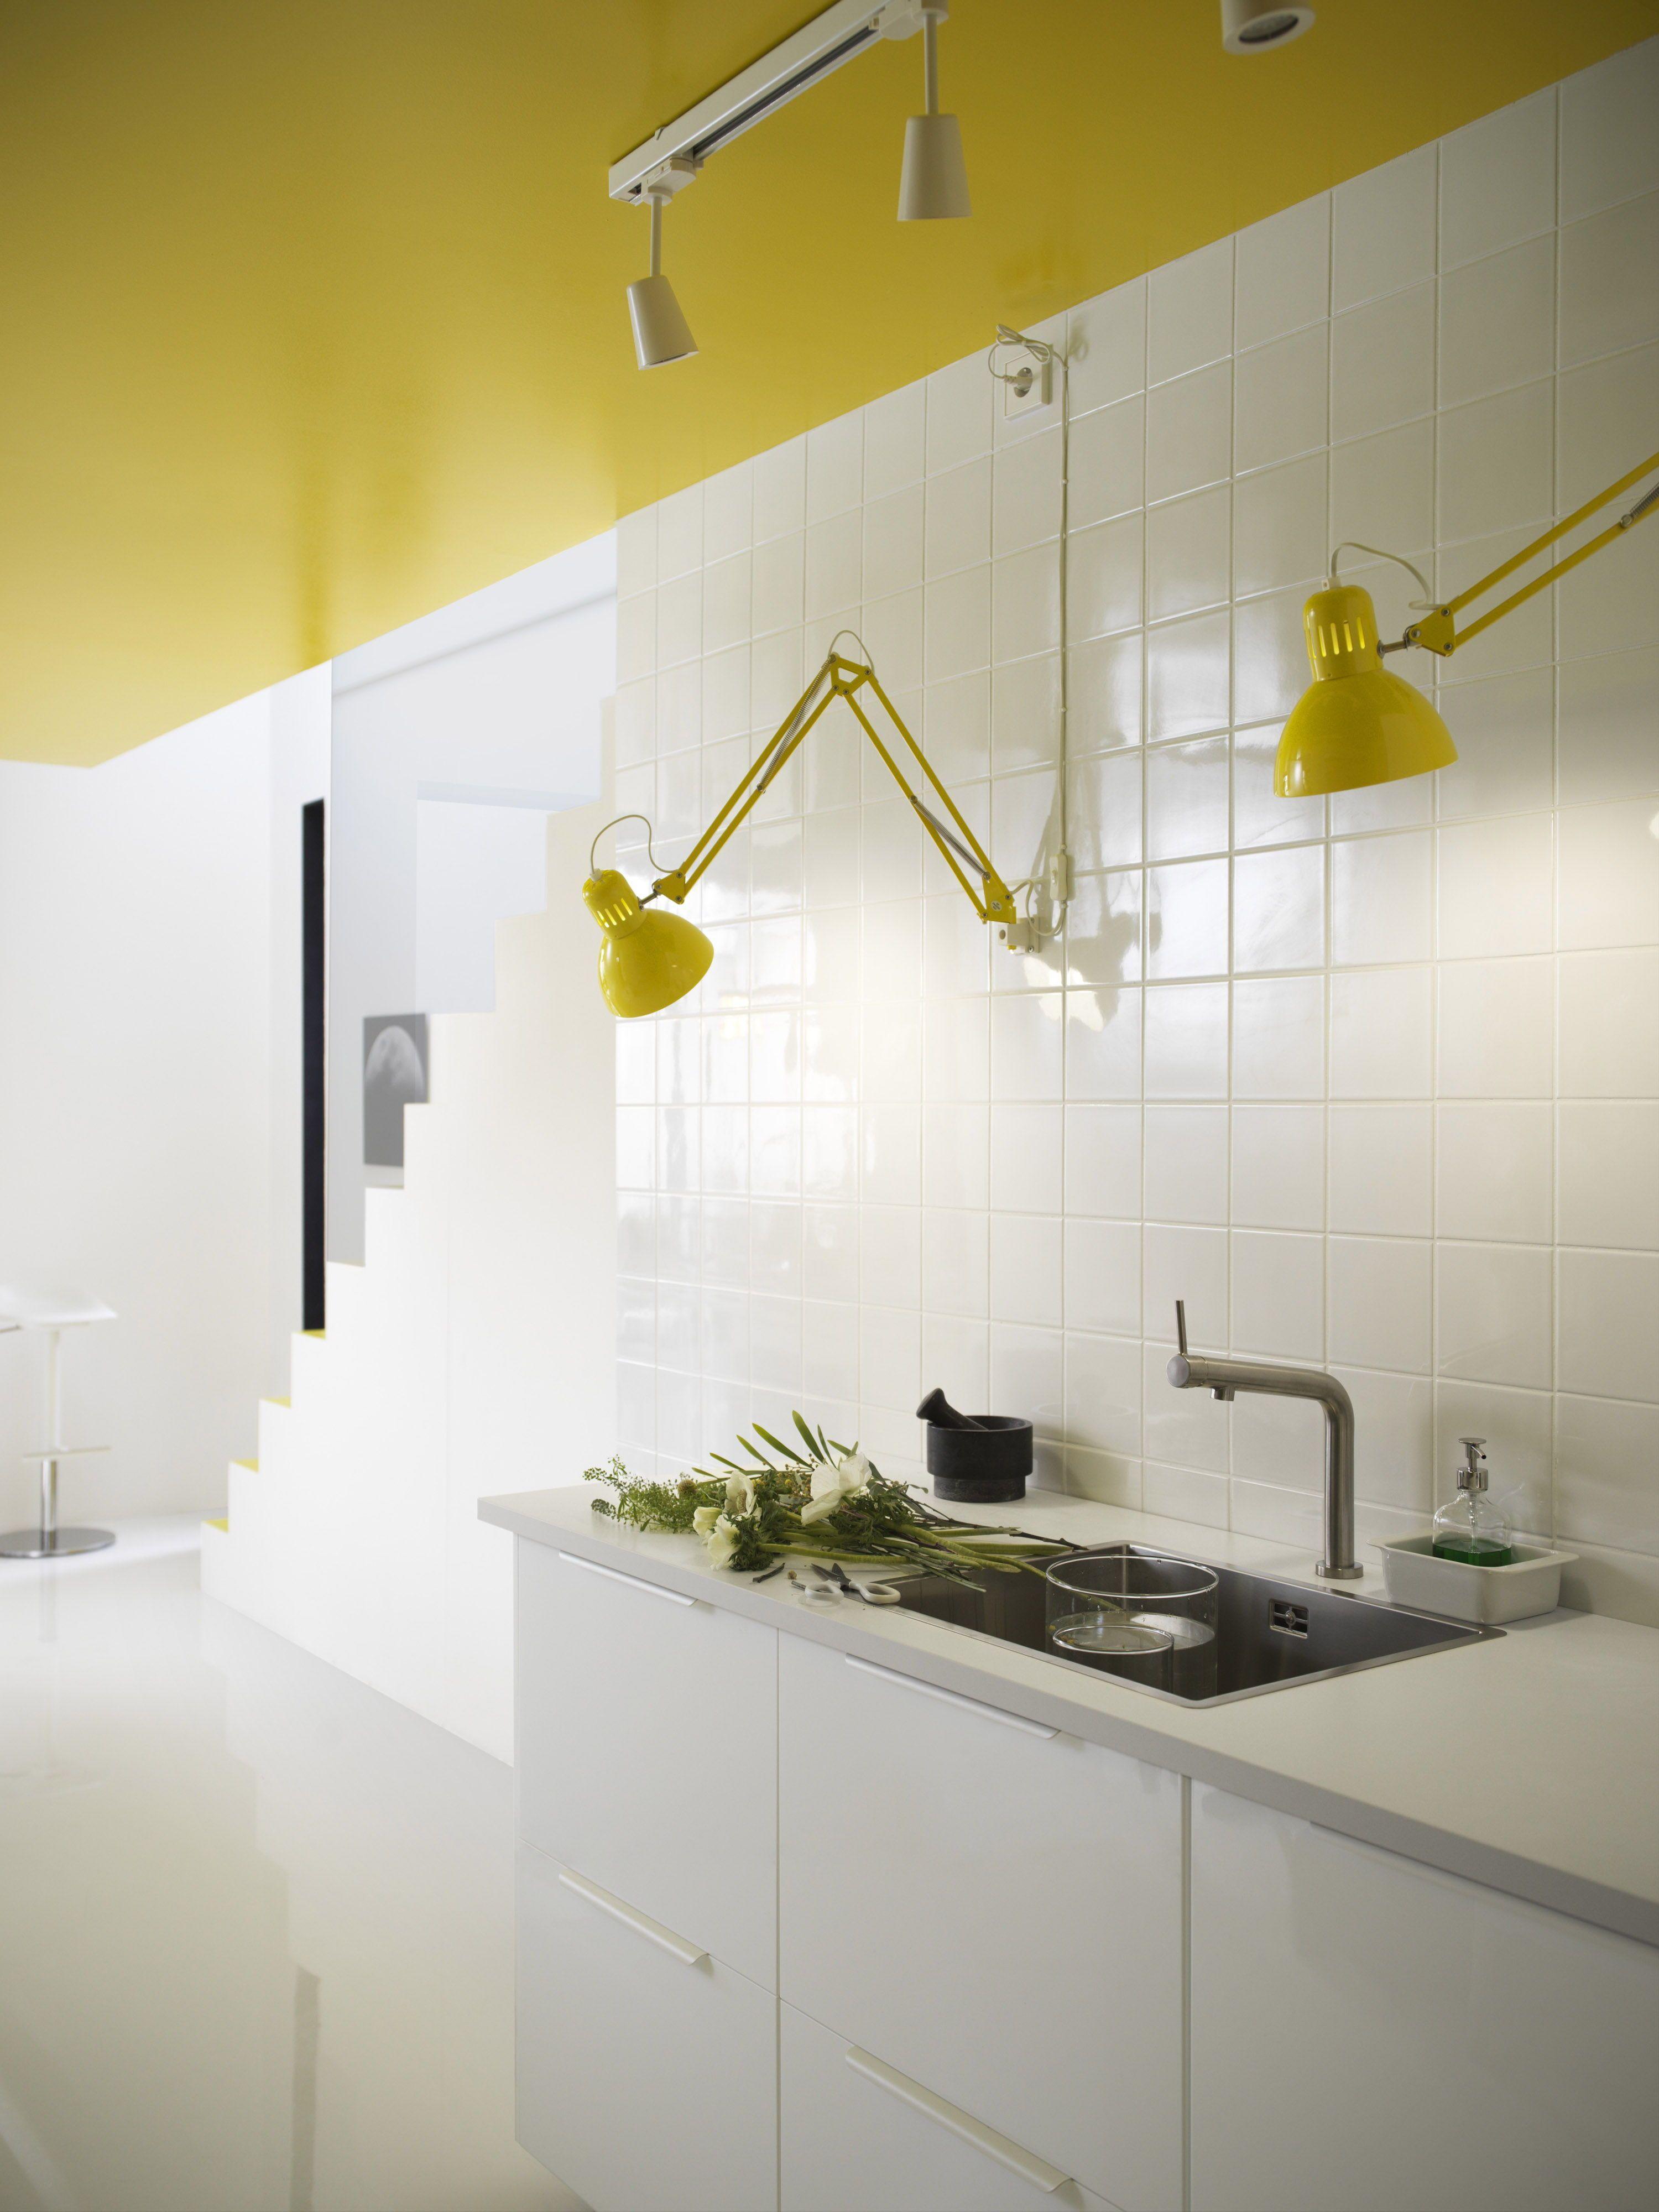 Ikea Nederland Interieur Online Bestellen Keukenverlichting Ikea Ikea Keuken